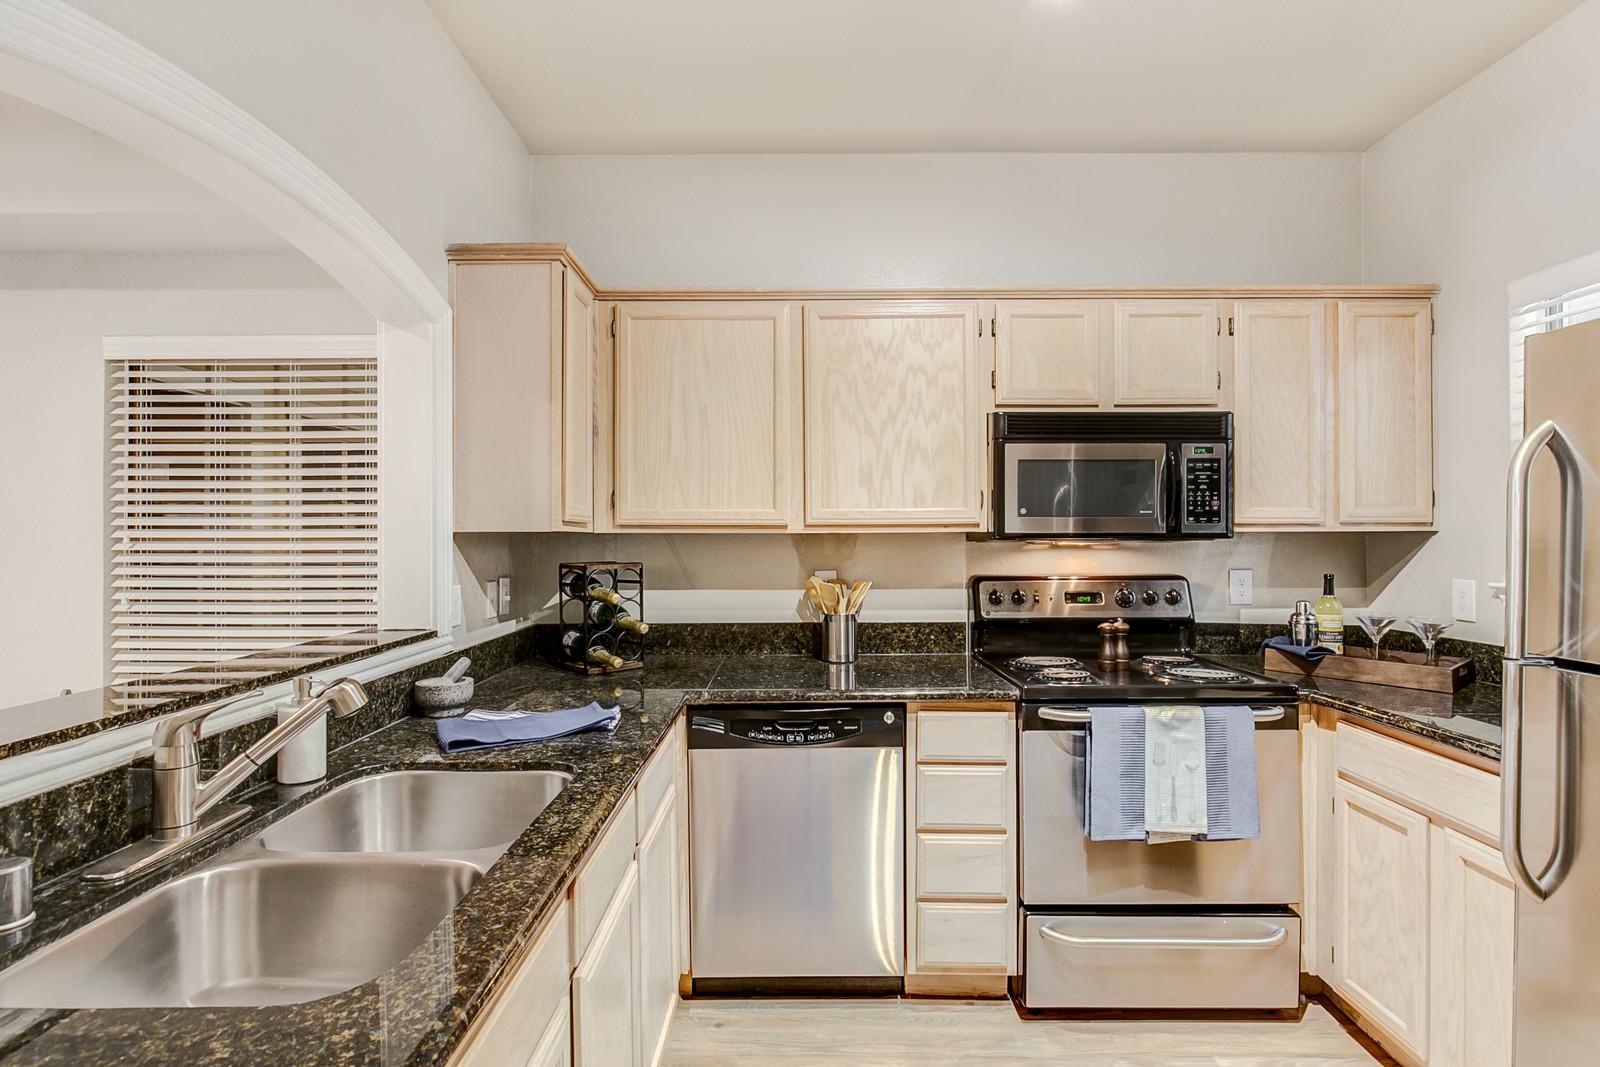 Kitchen at Rivera at West Village Apartments